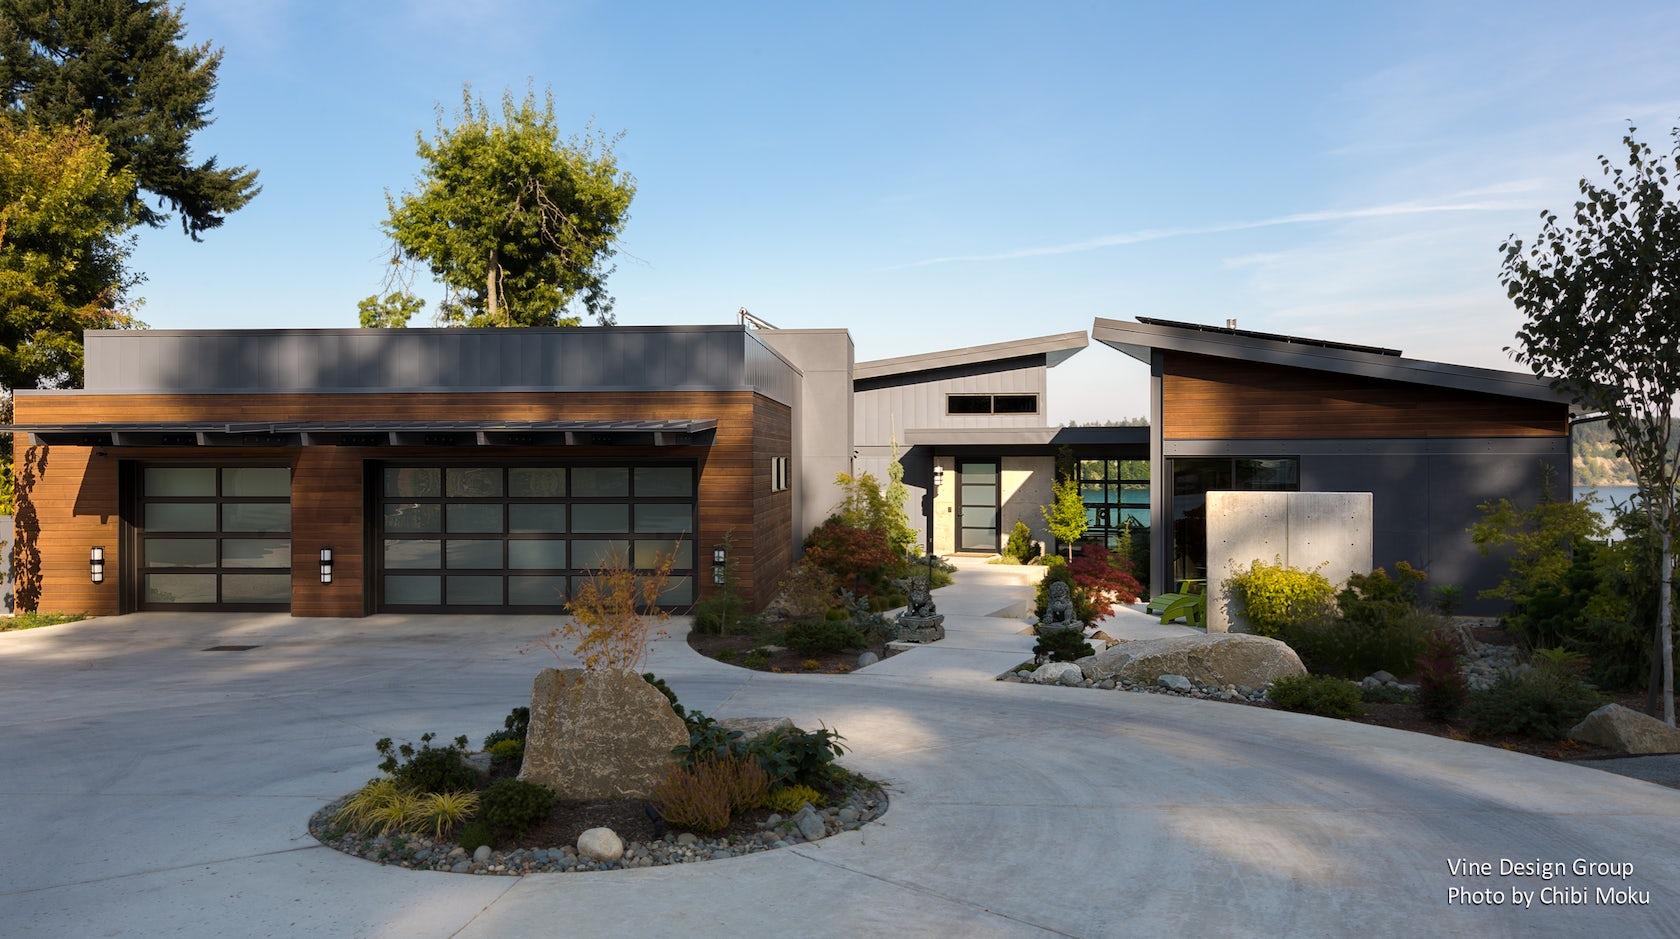 Vine Design Group Quot Creative Sustainability Quot Gig Harbor